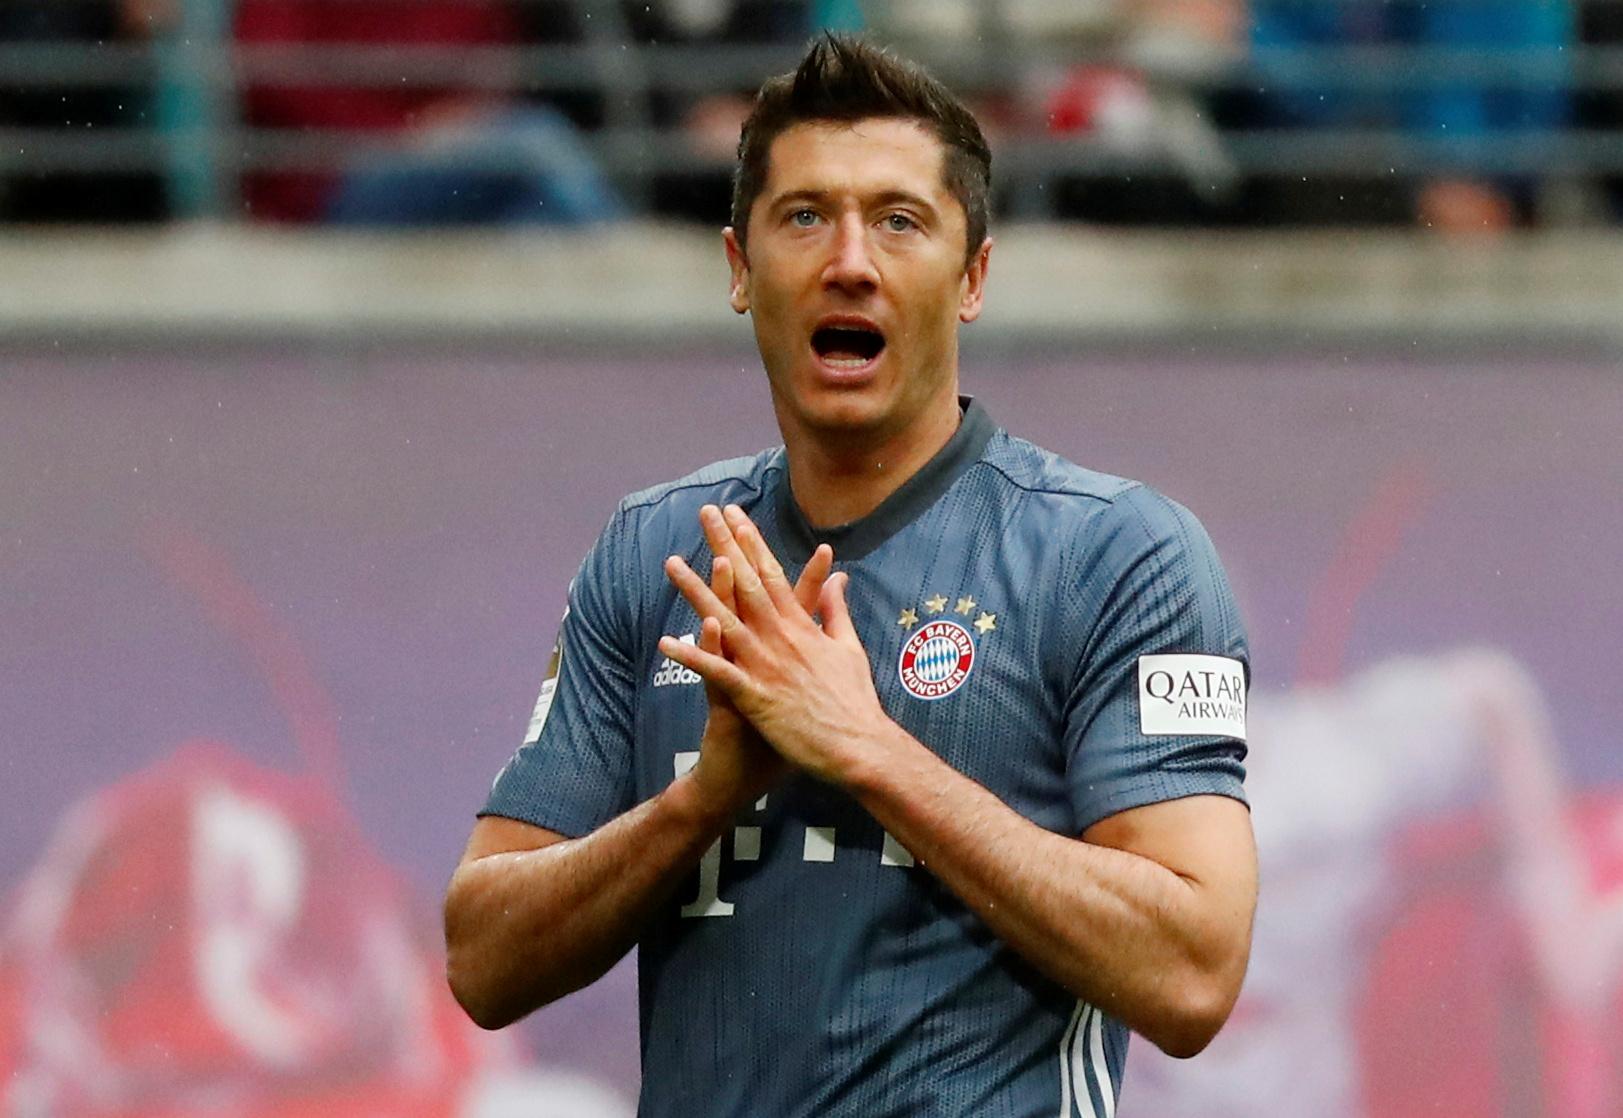 Football - Transferts - Le journal du mercato : Le PSG veut prolonger Buffon et drague Lewandowski